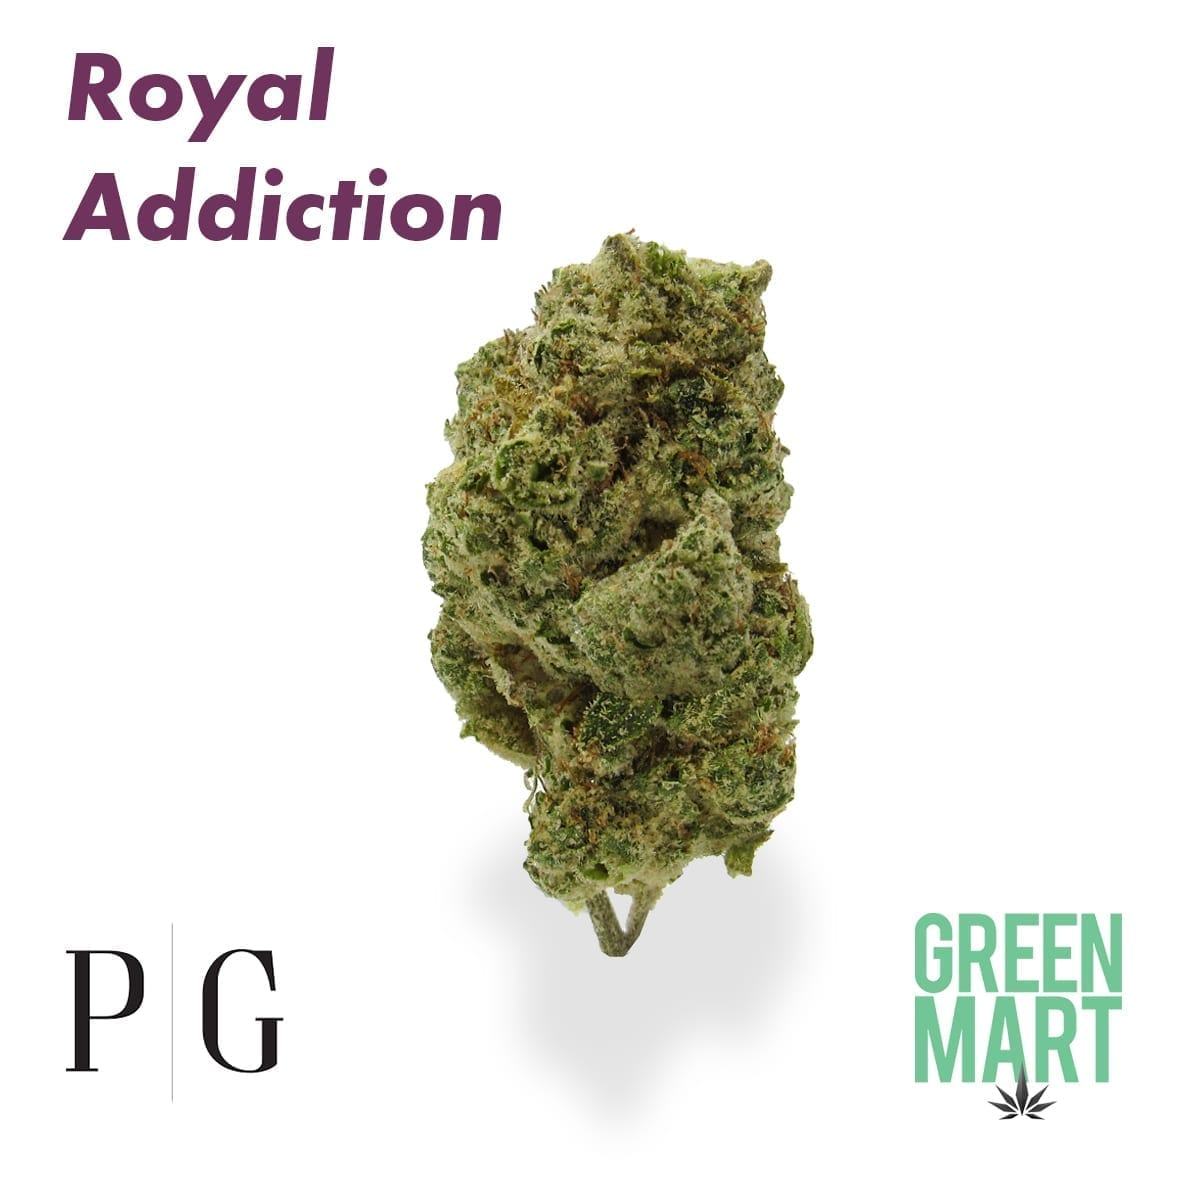 Royal Addiction